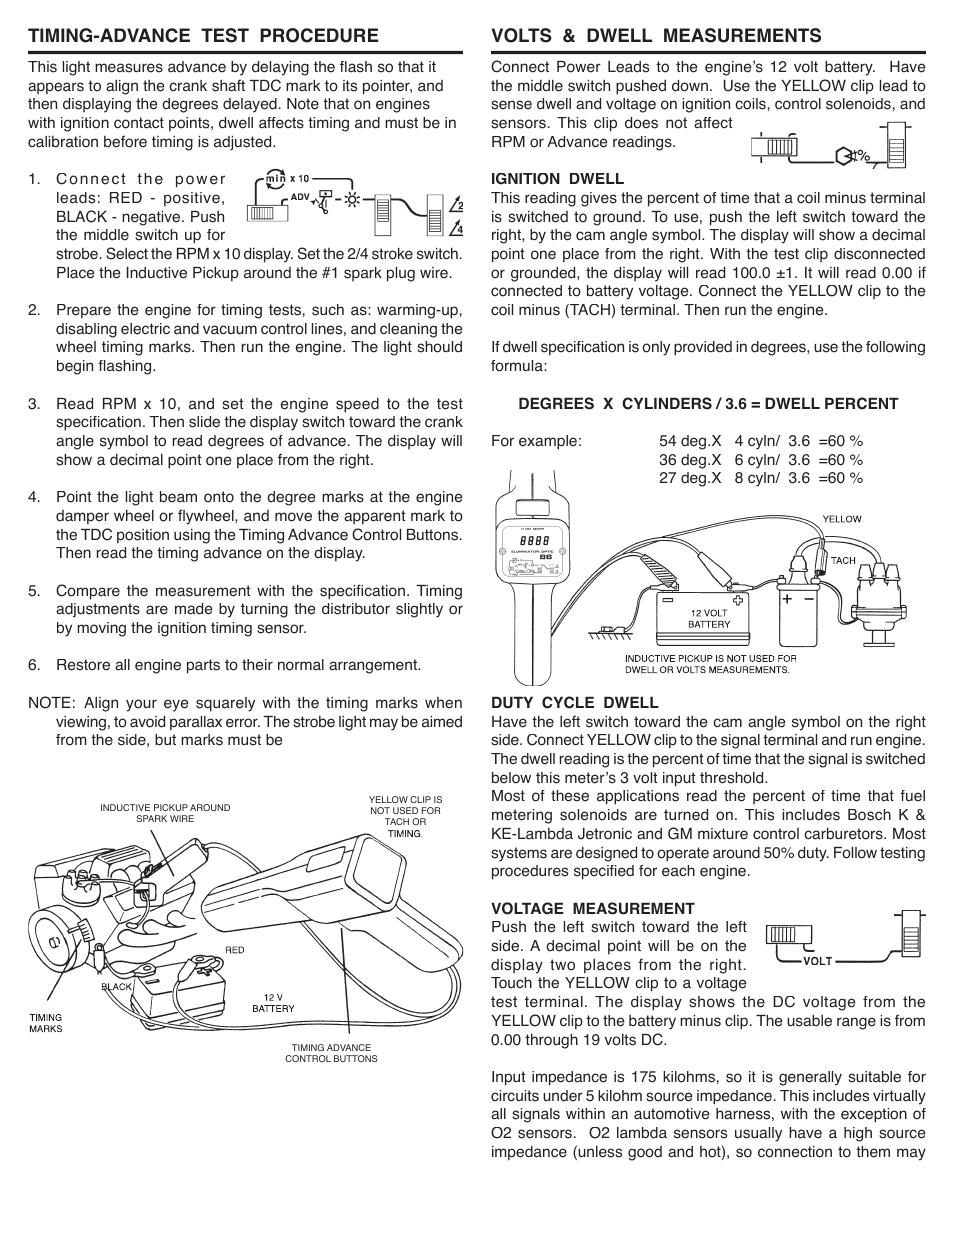 Timing-advance test procedure, Volts & dwell measurements   GxT V086-01,  Ferret 86, Tach-Adv-Dwell-Volts Timing Light User Manual   Page 2 / 2